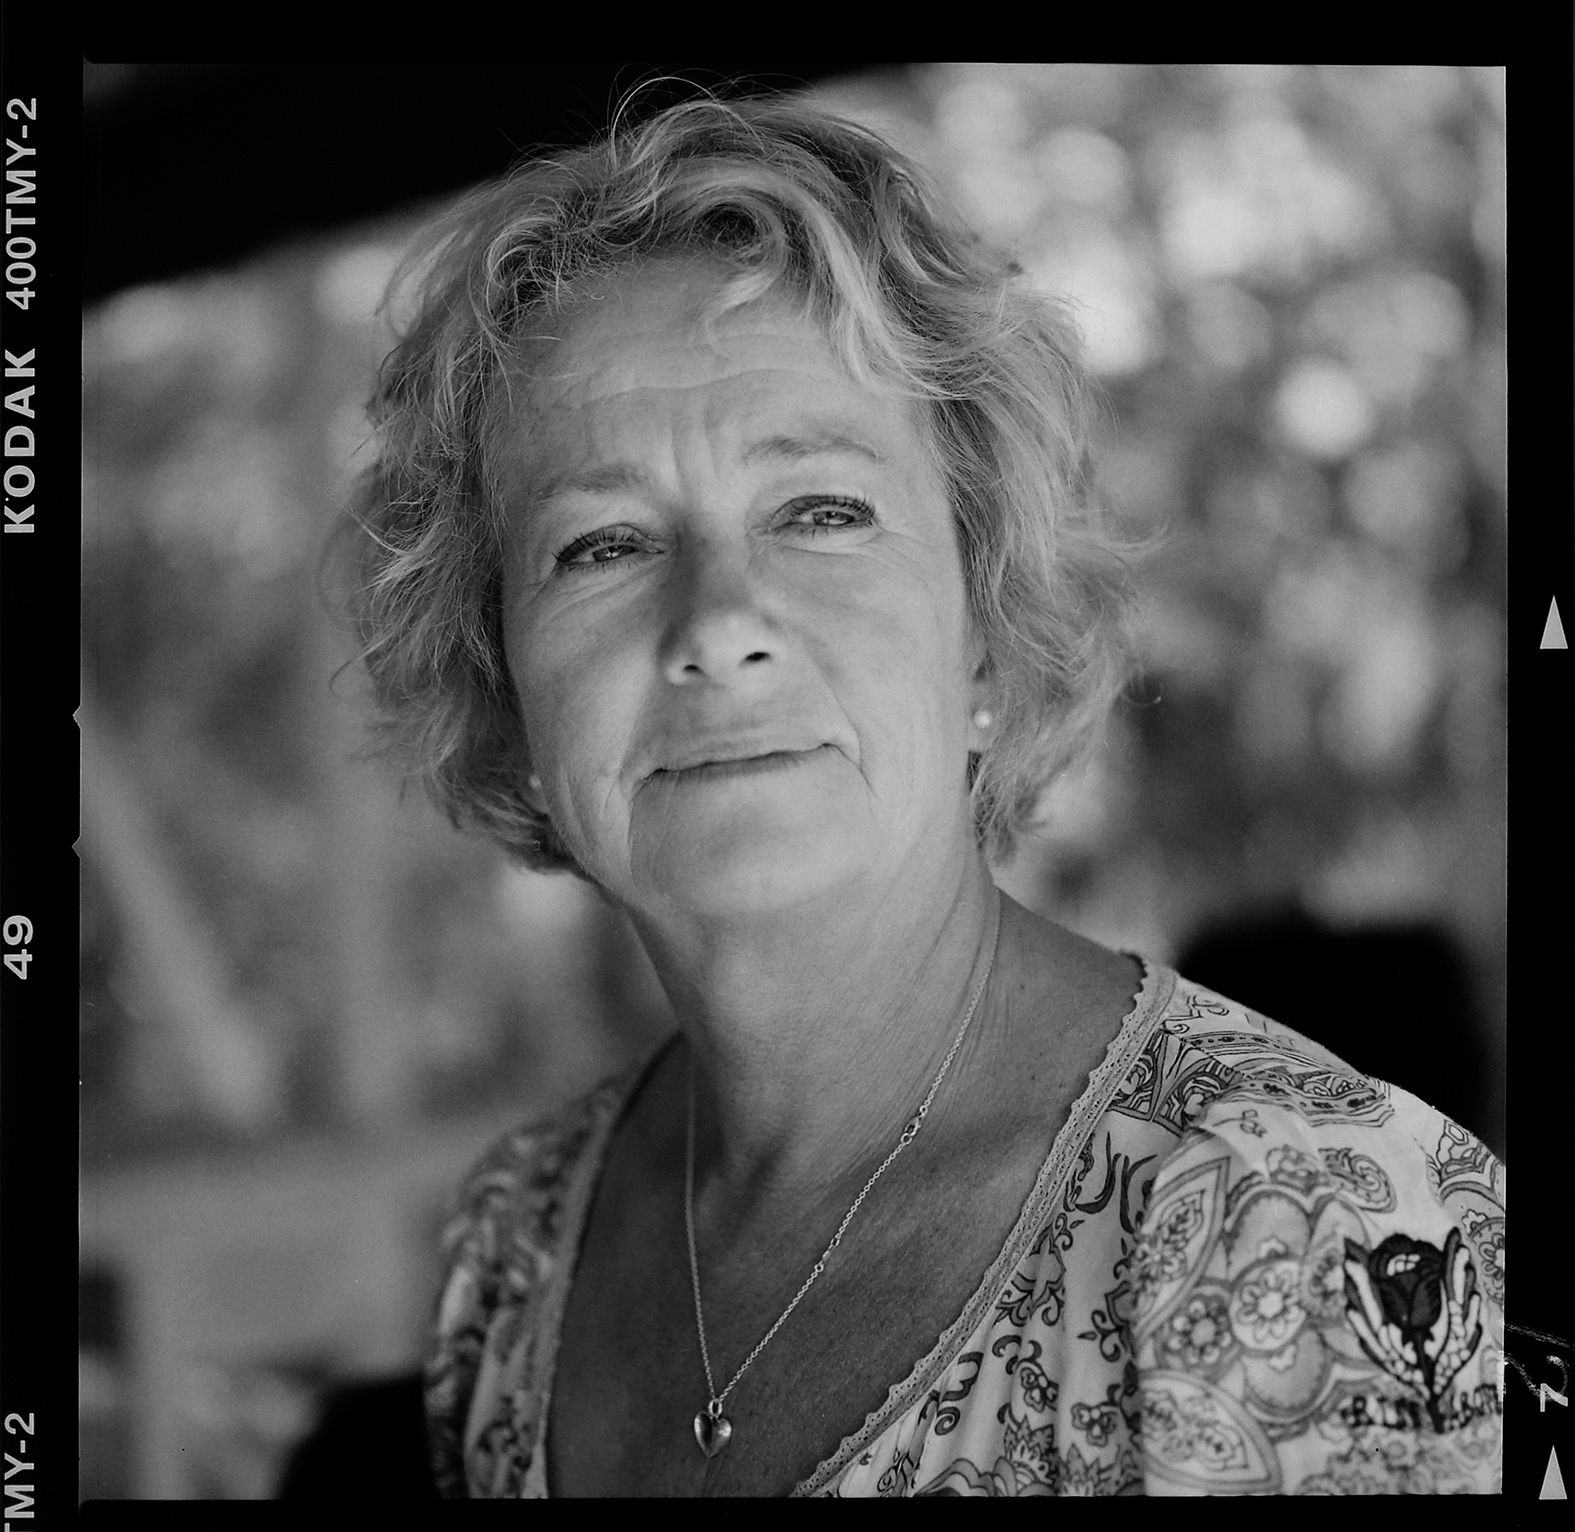 Lotta Brolin på Mary´s butik & café. Foto: Mikael Andersson, 2016-05-31, Hasselblad 500 cm, 150mm, f4-1/500